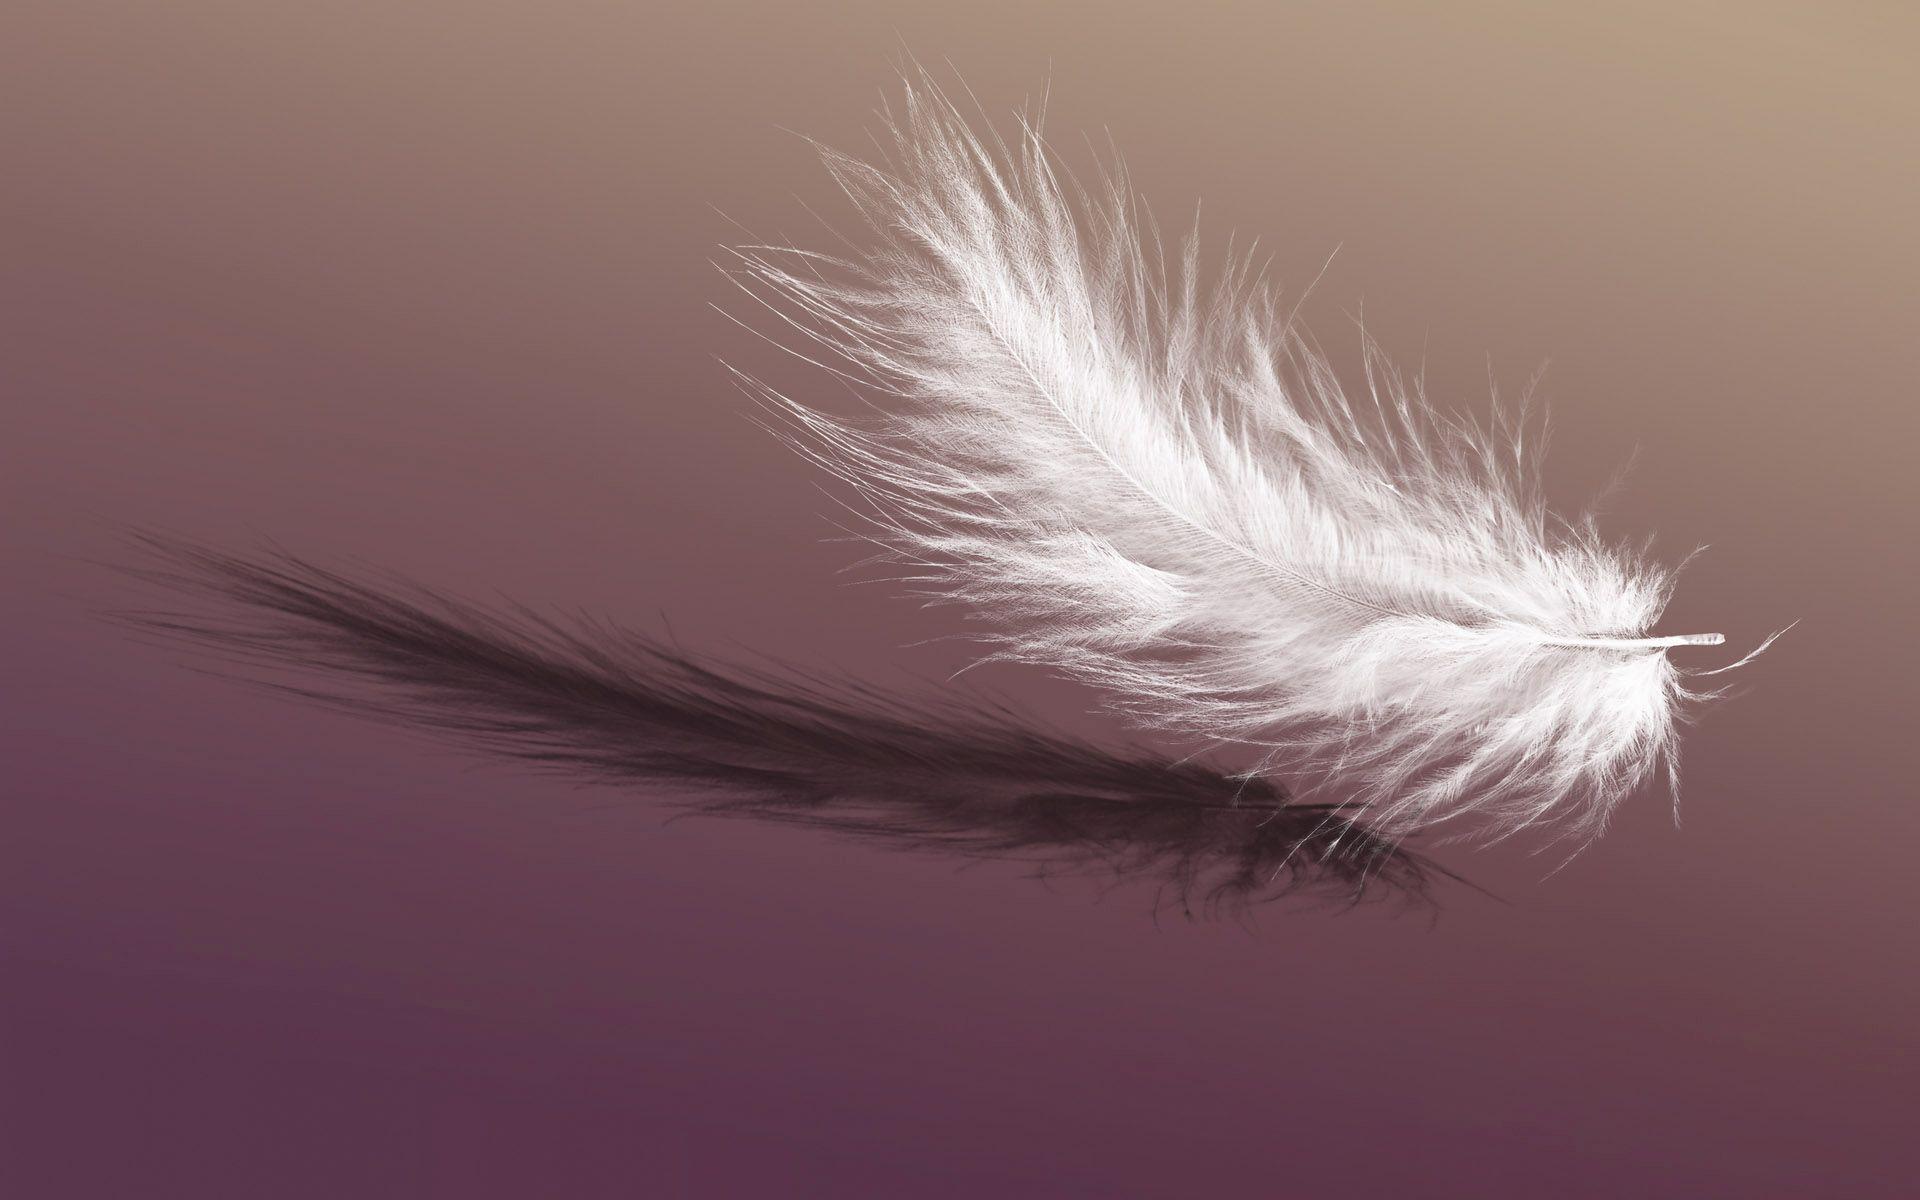 [39+] Feathers Falling Wallpaper on WallpaperSafari